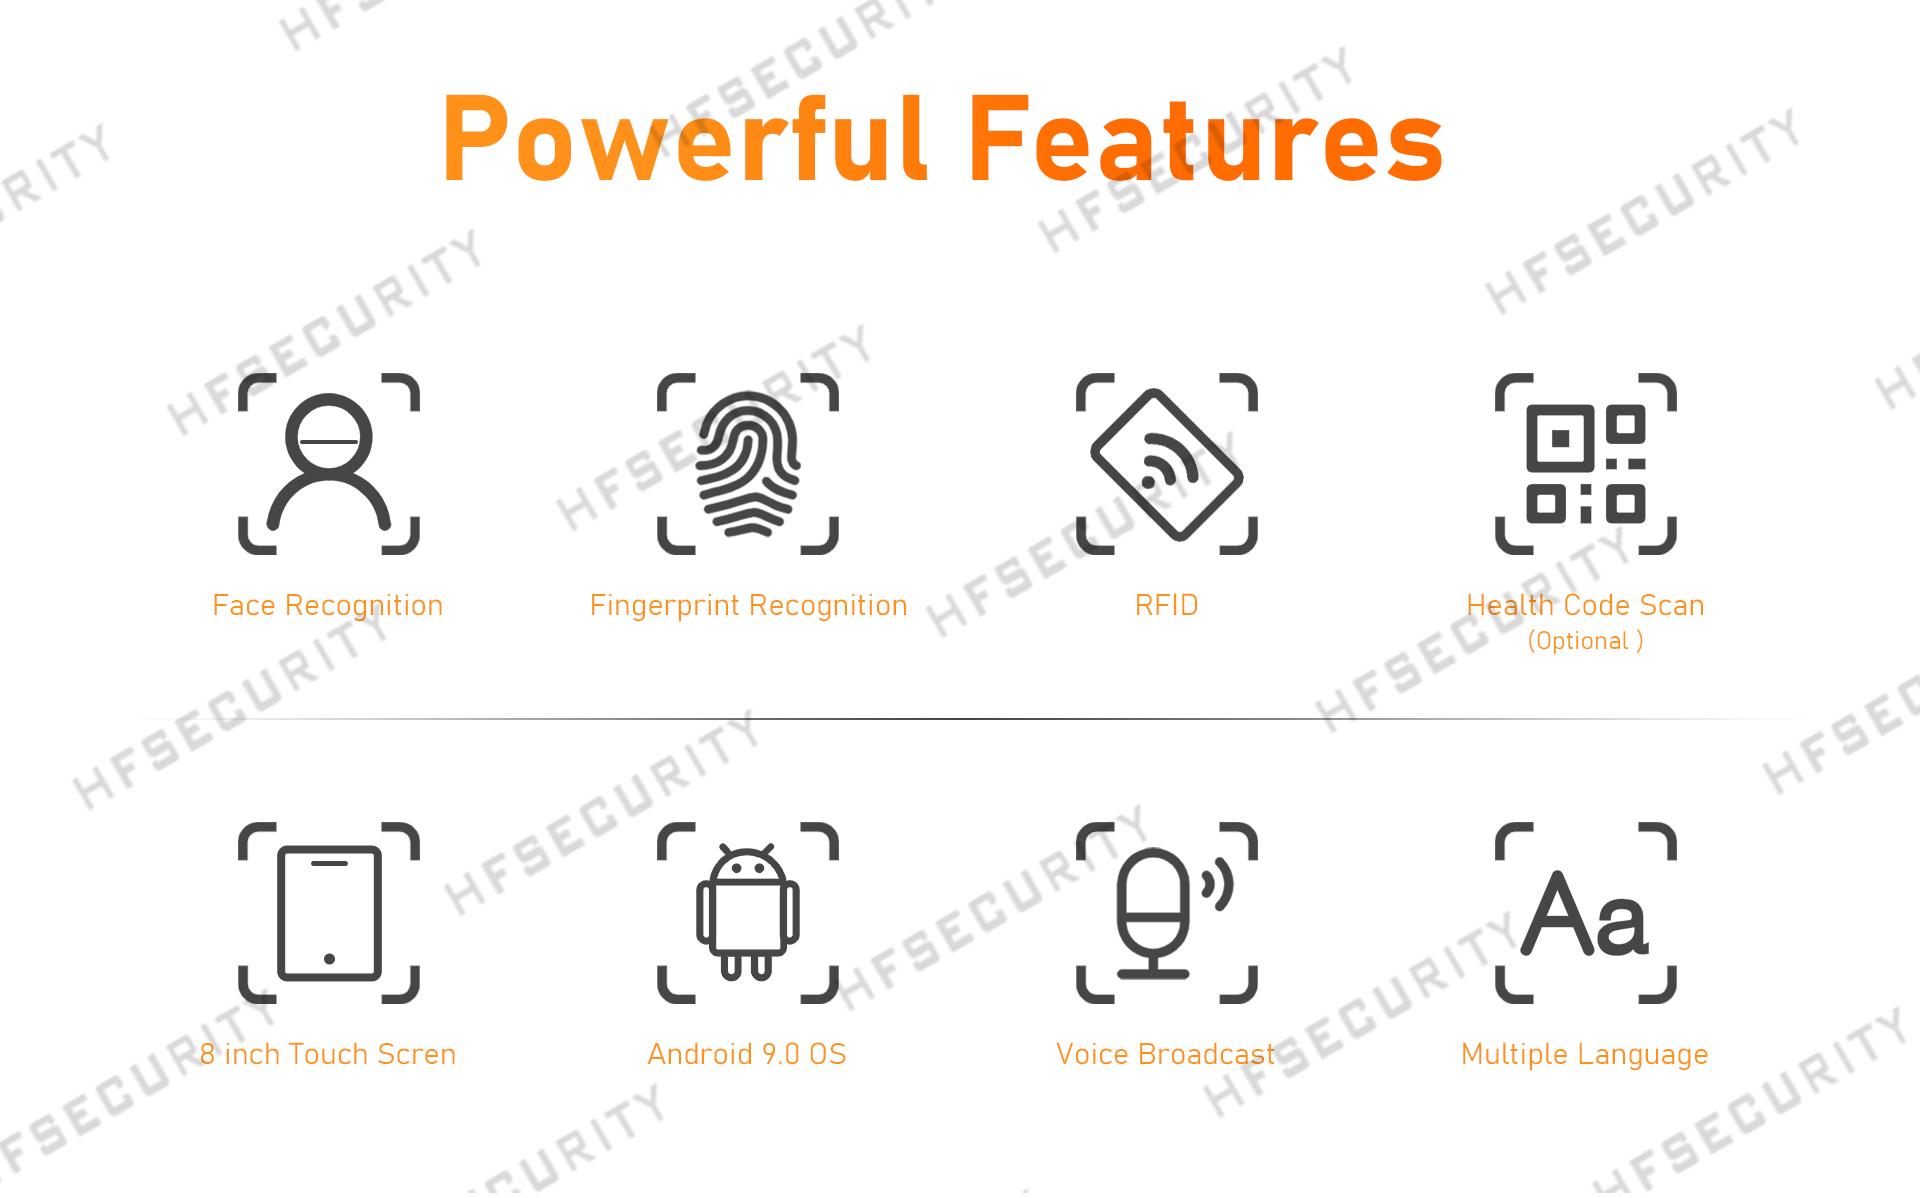 HFSecurity 8 inch Fingerprint Face Recognition Device